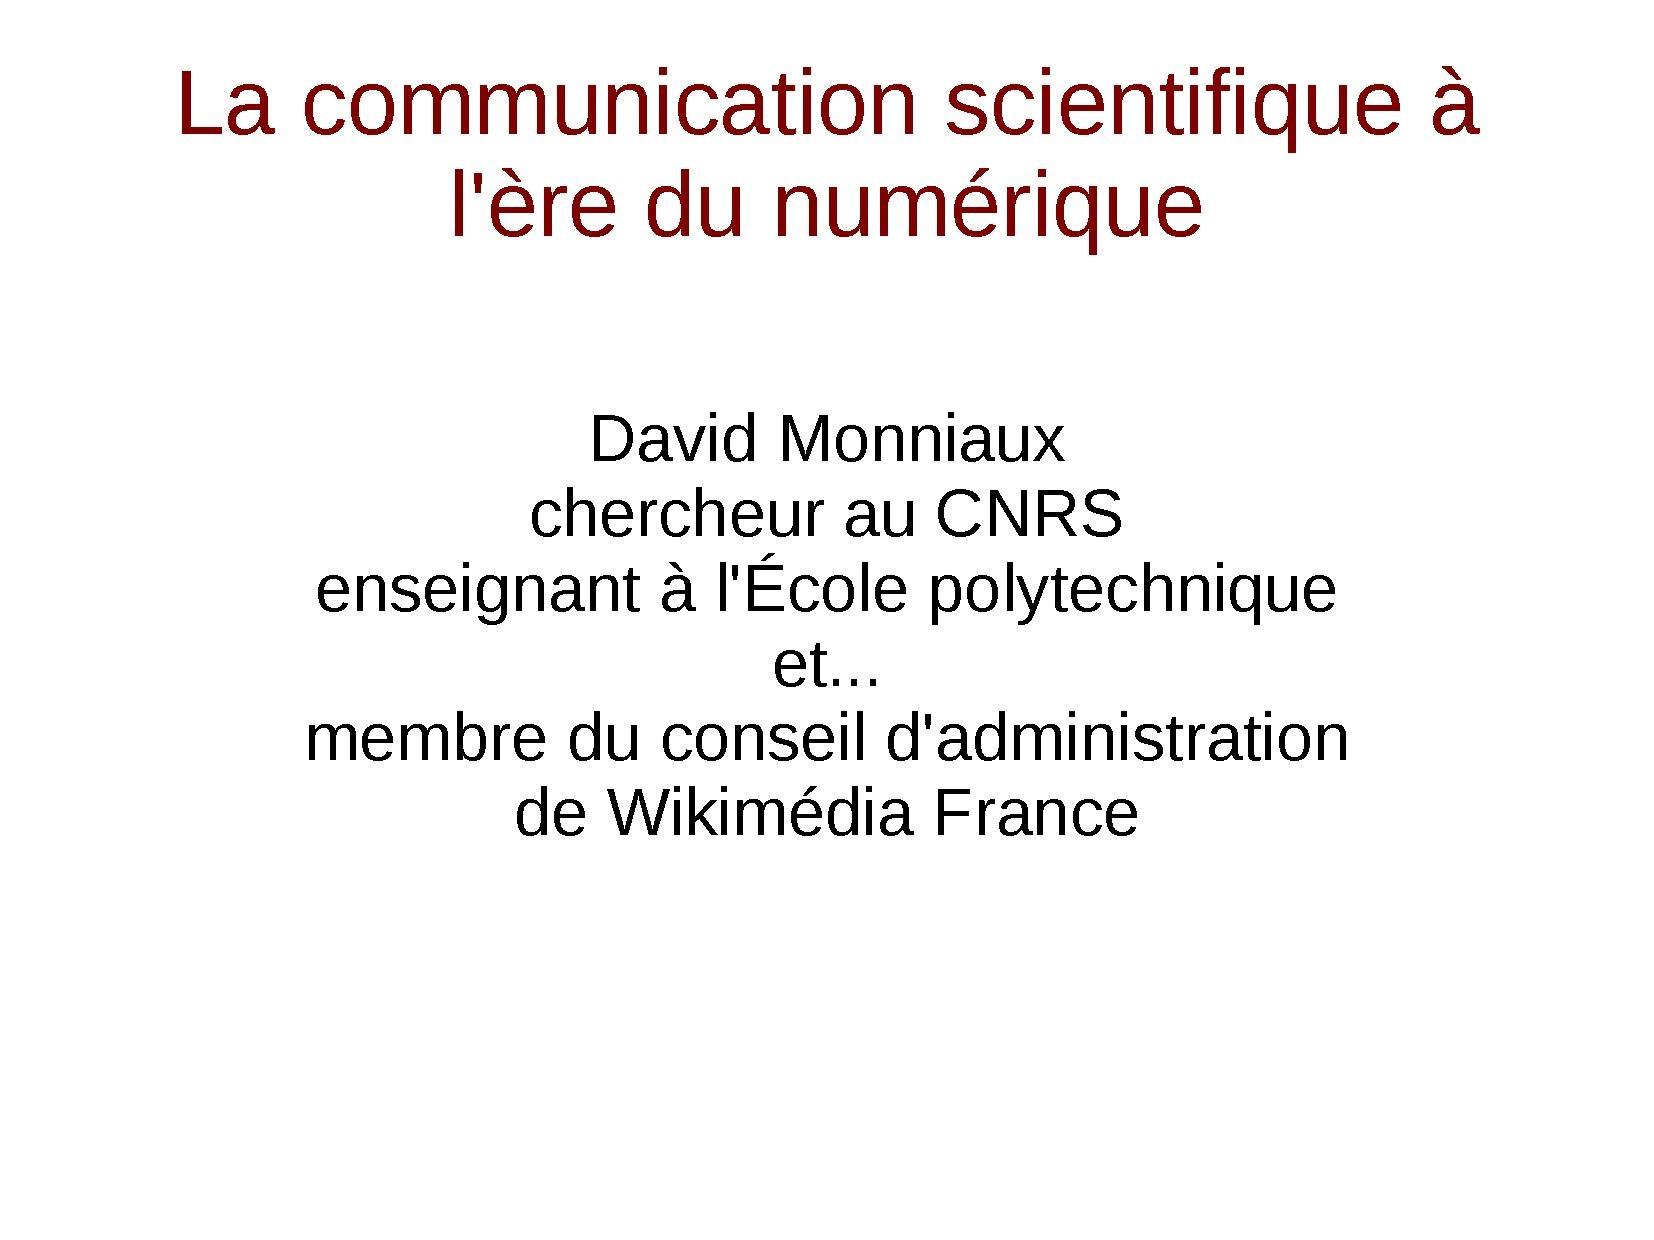 types of communication pdf file